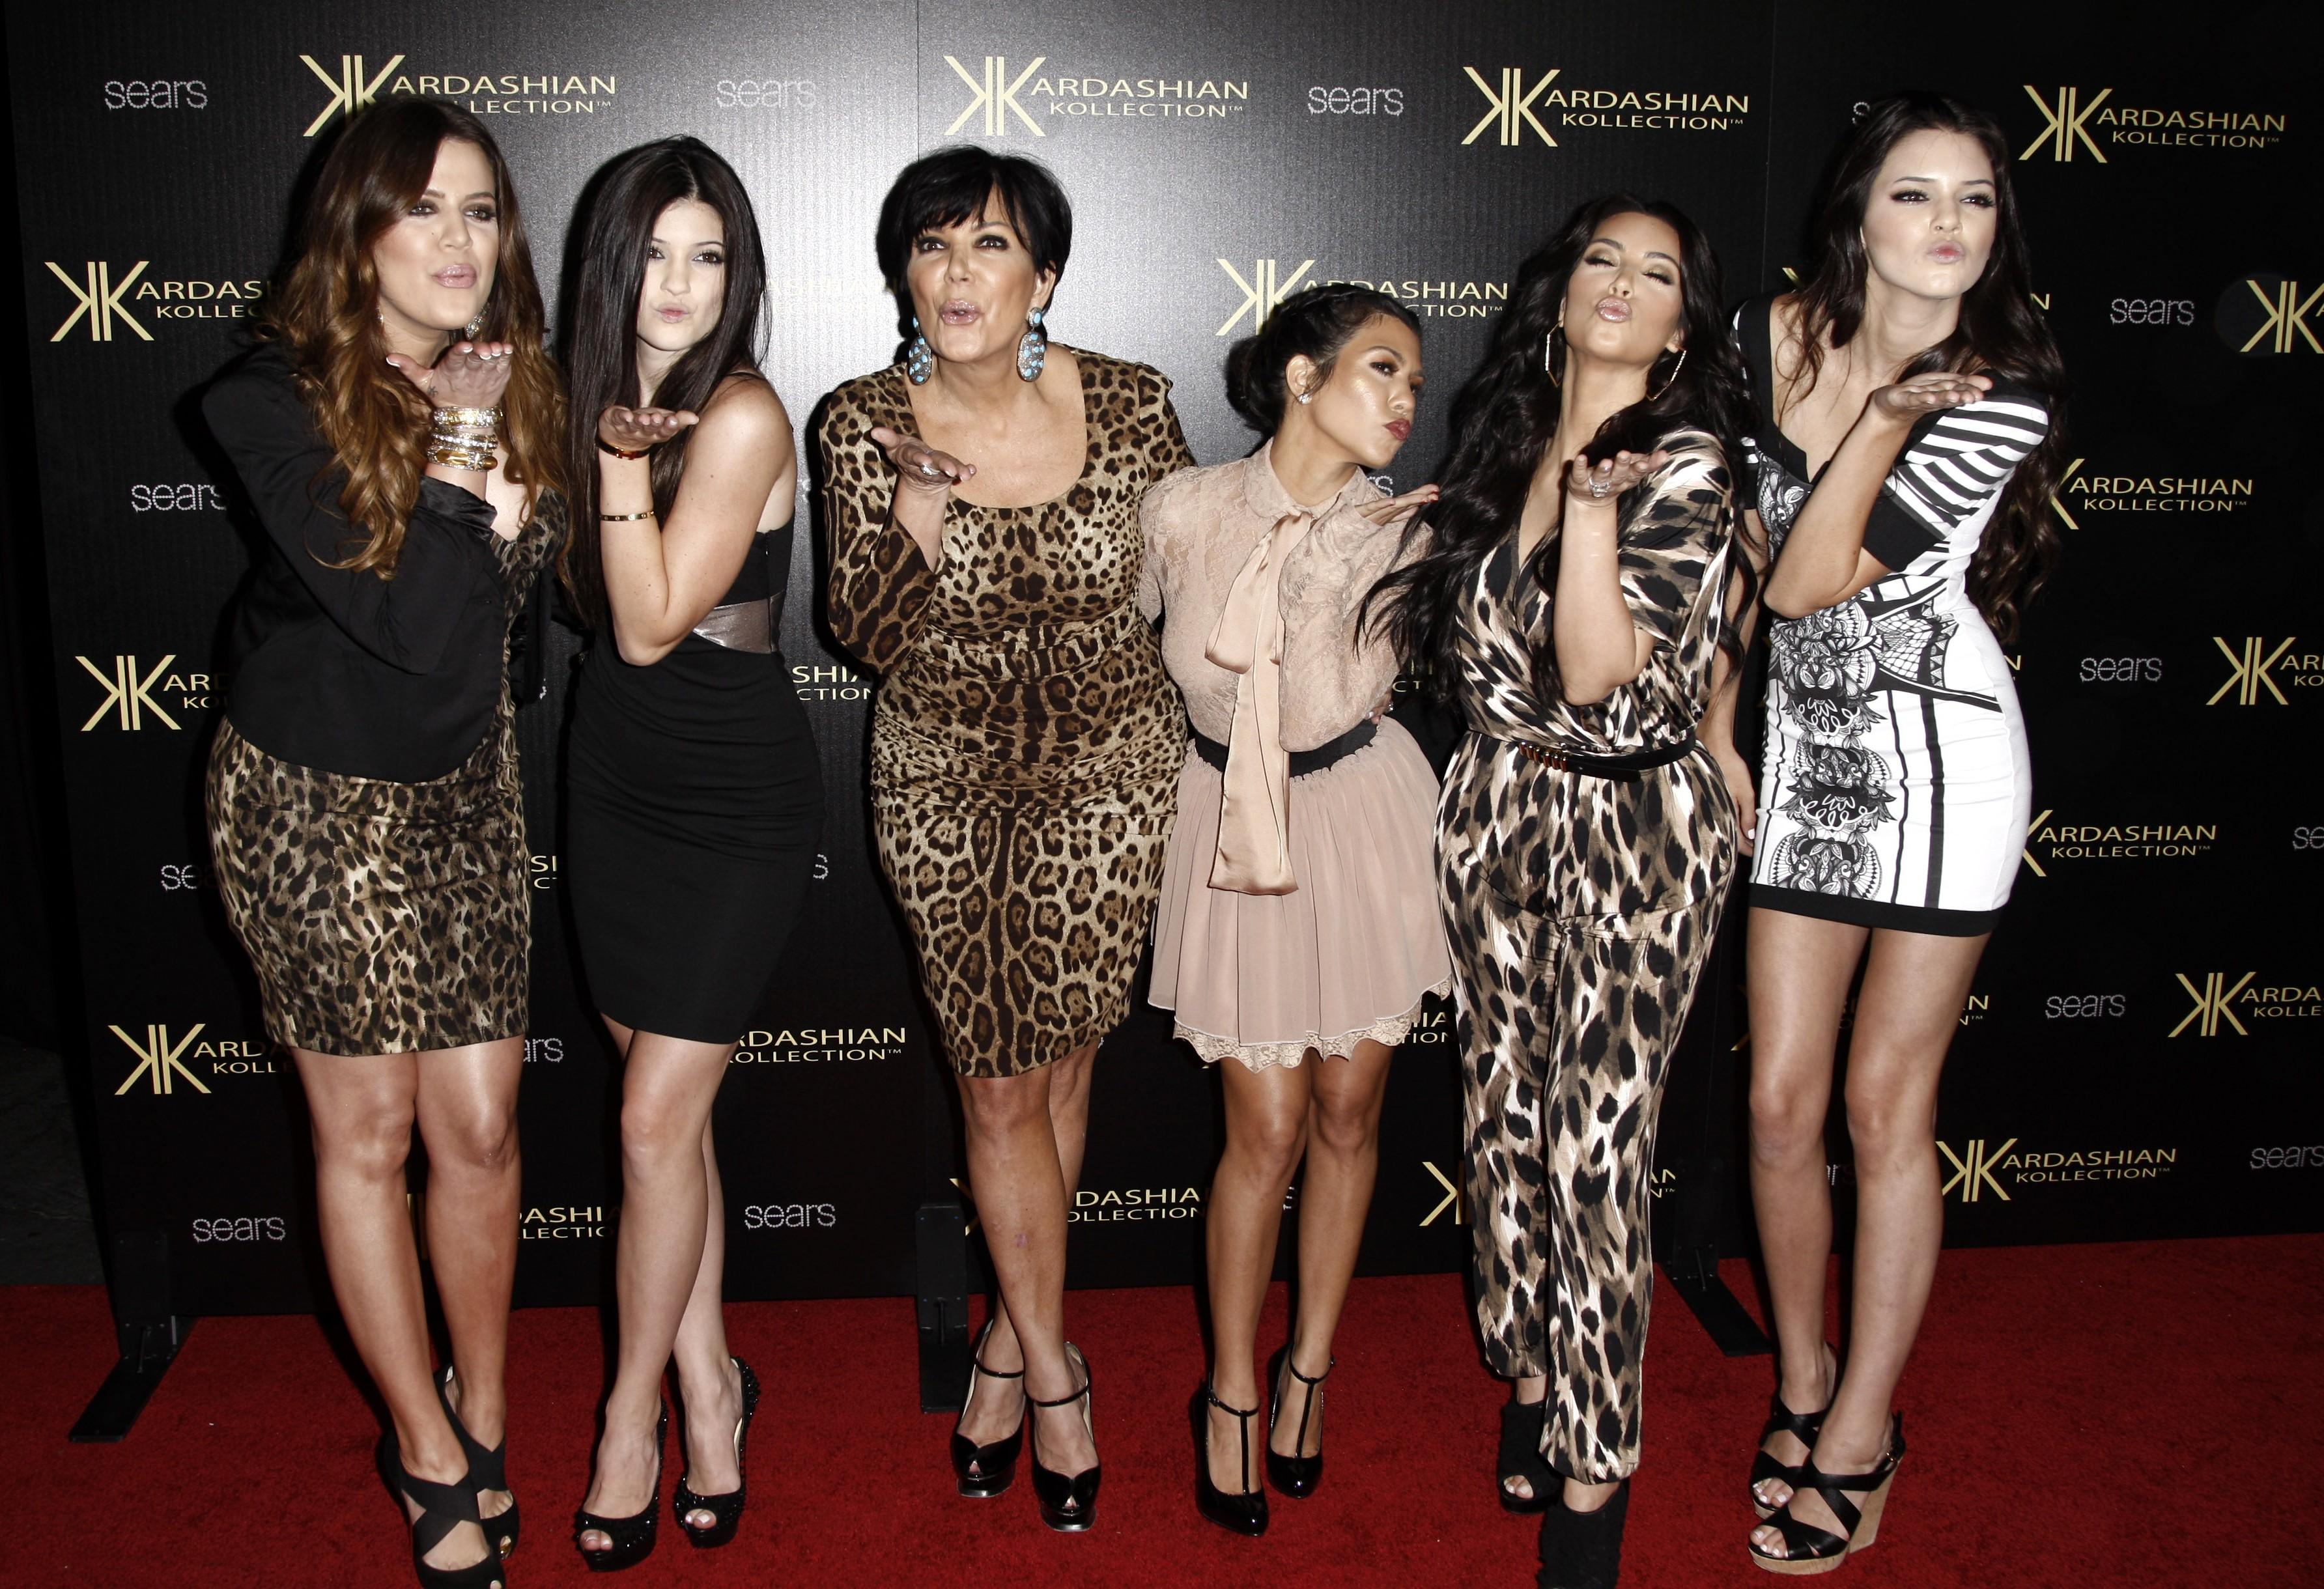 las-kardashian